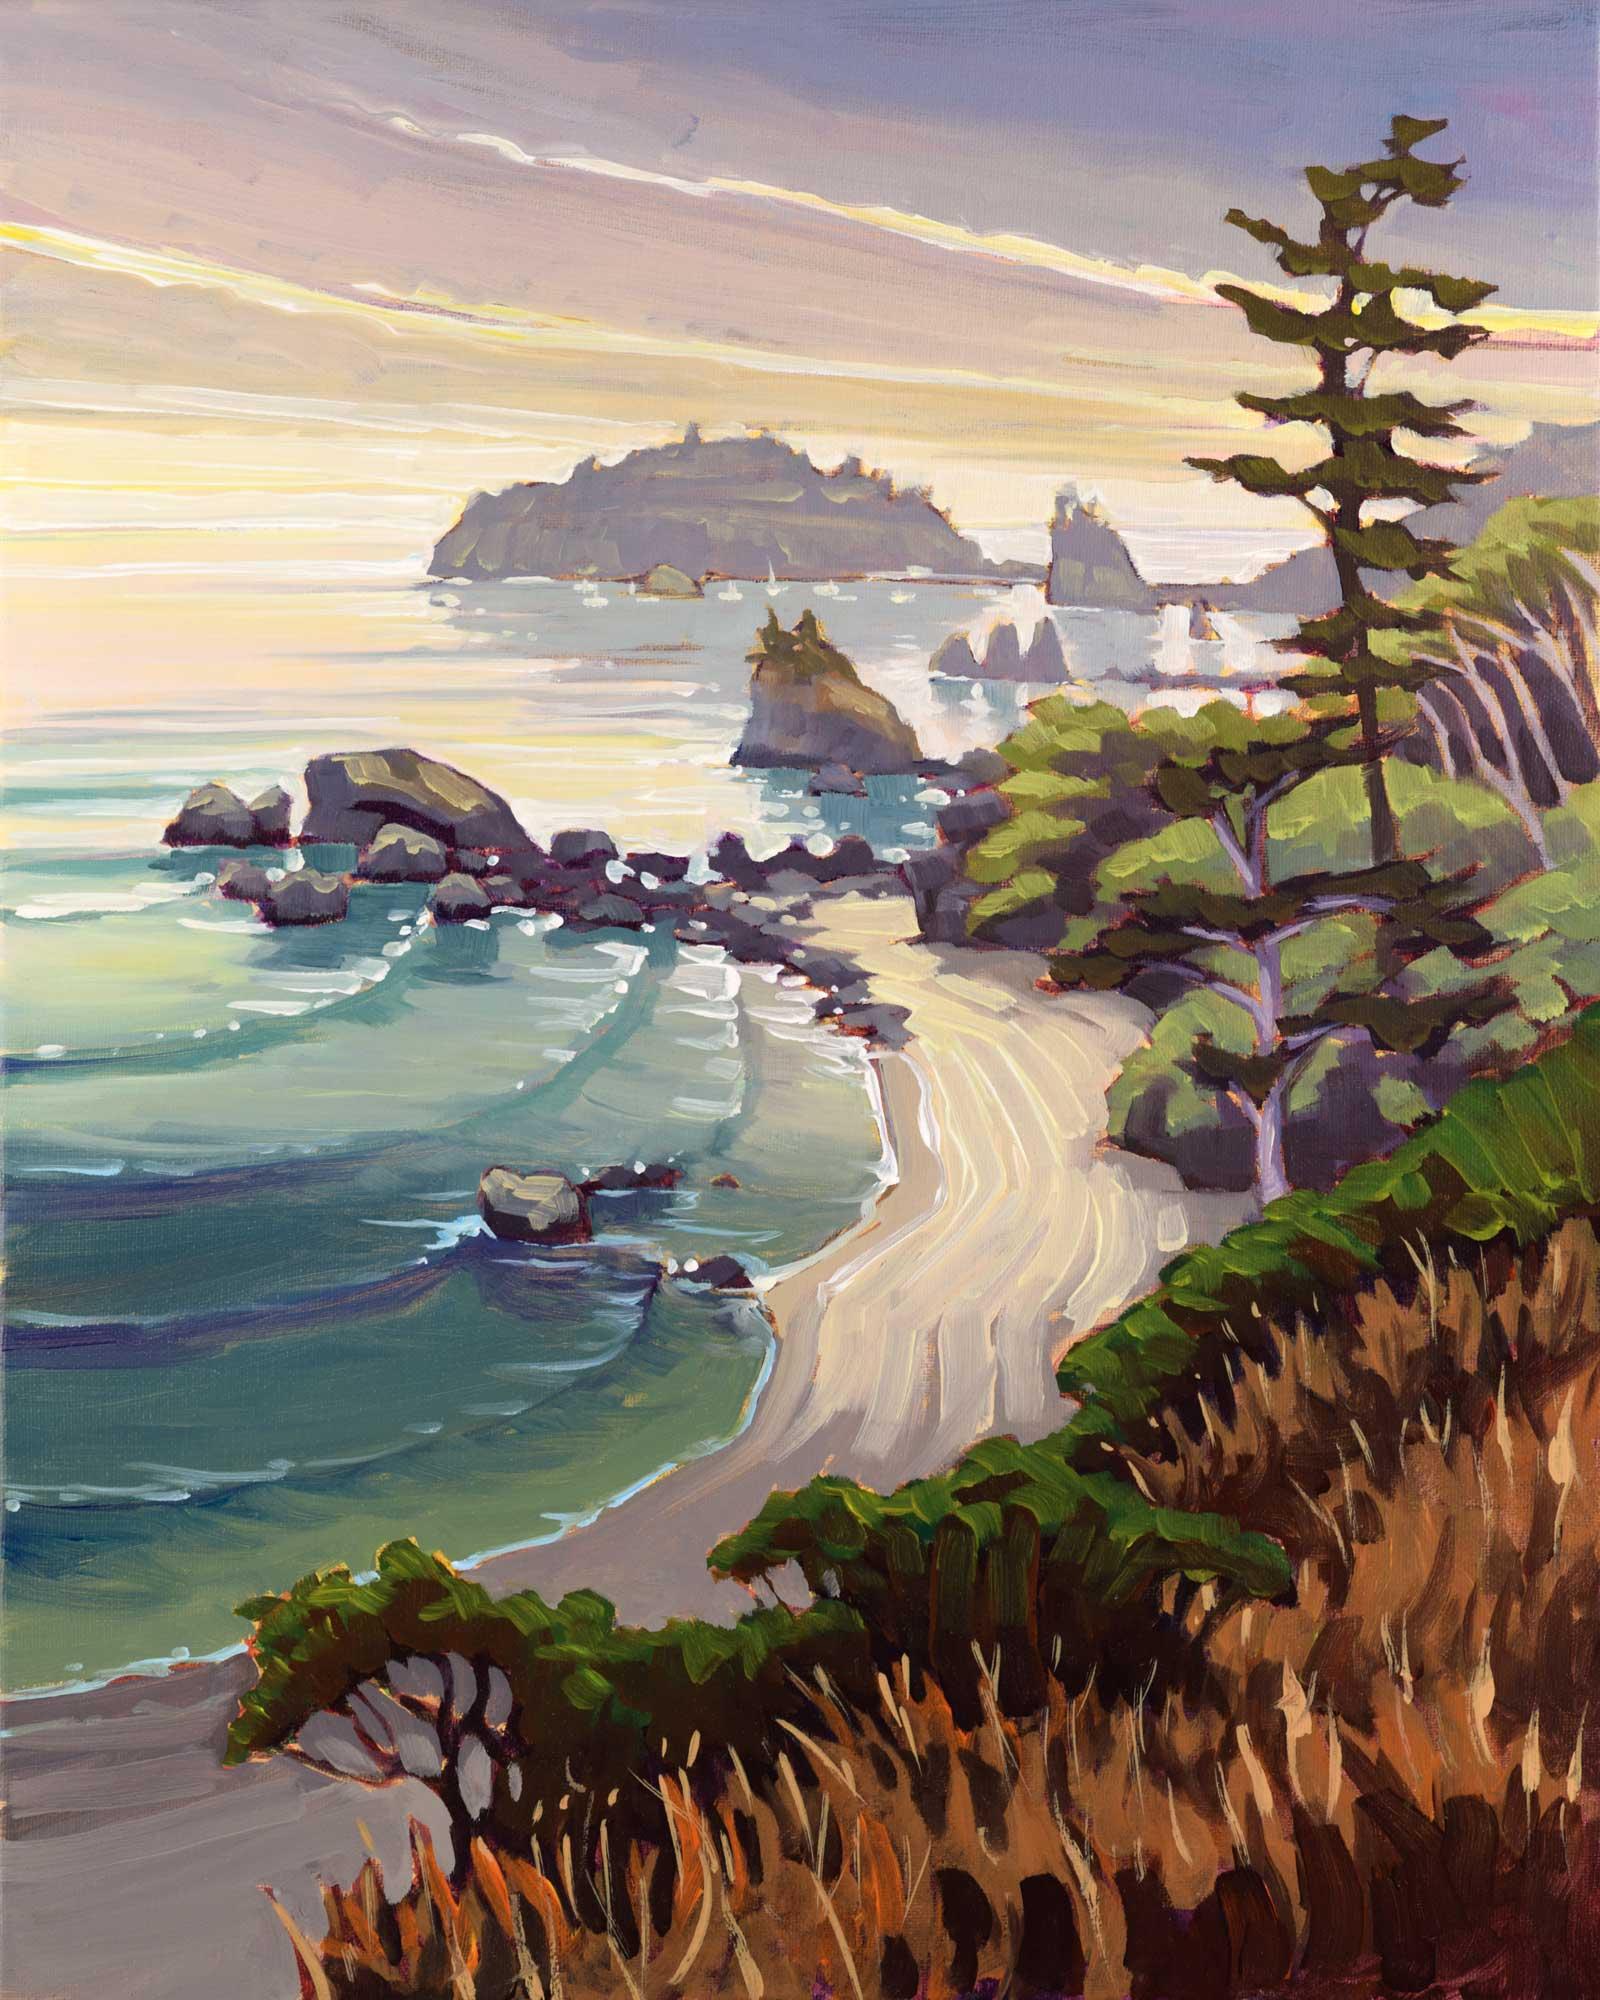 A plein air landscape of Baker Beach on Humboldt county's Trinidad coast of northern California